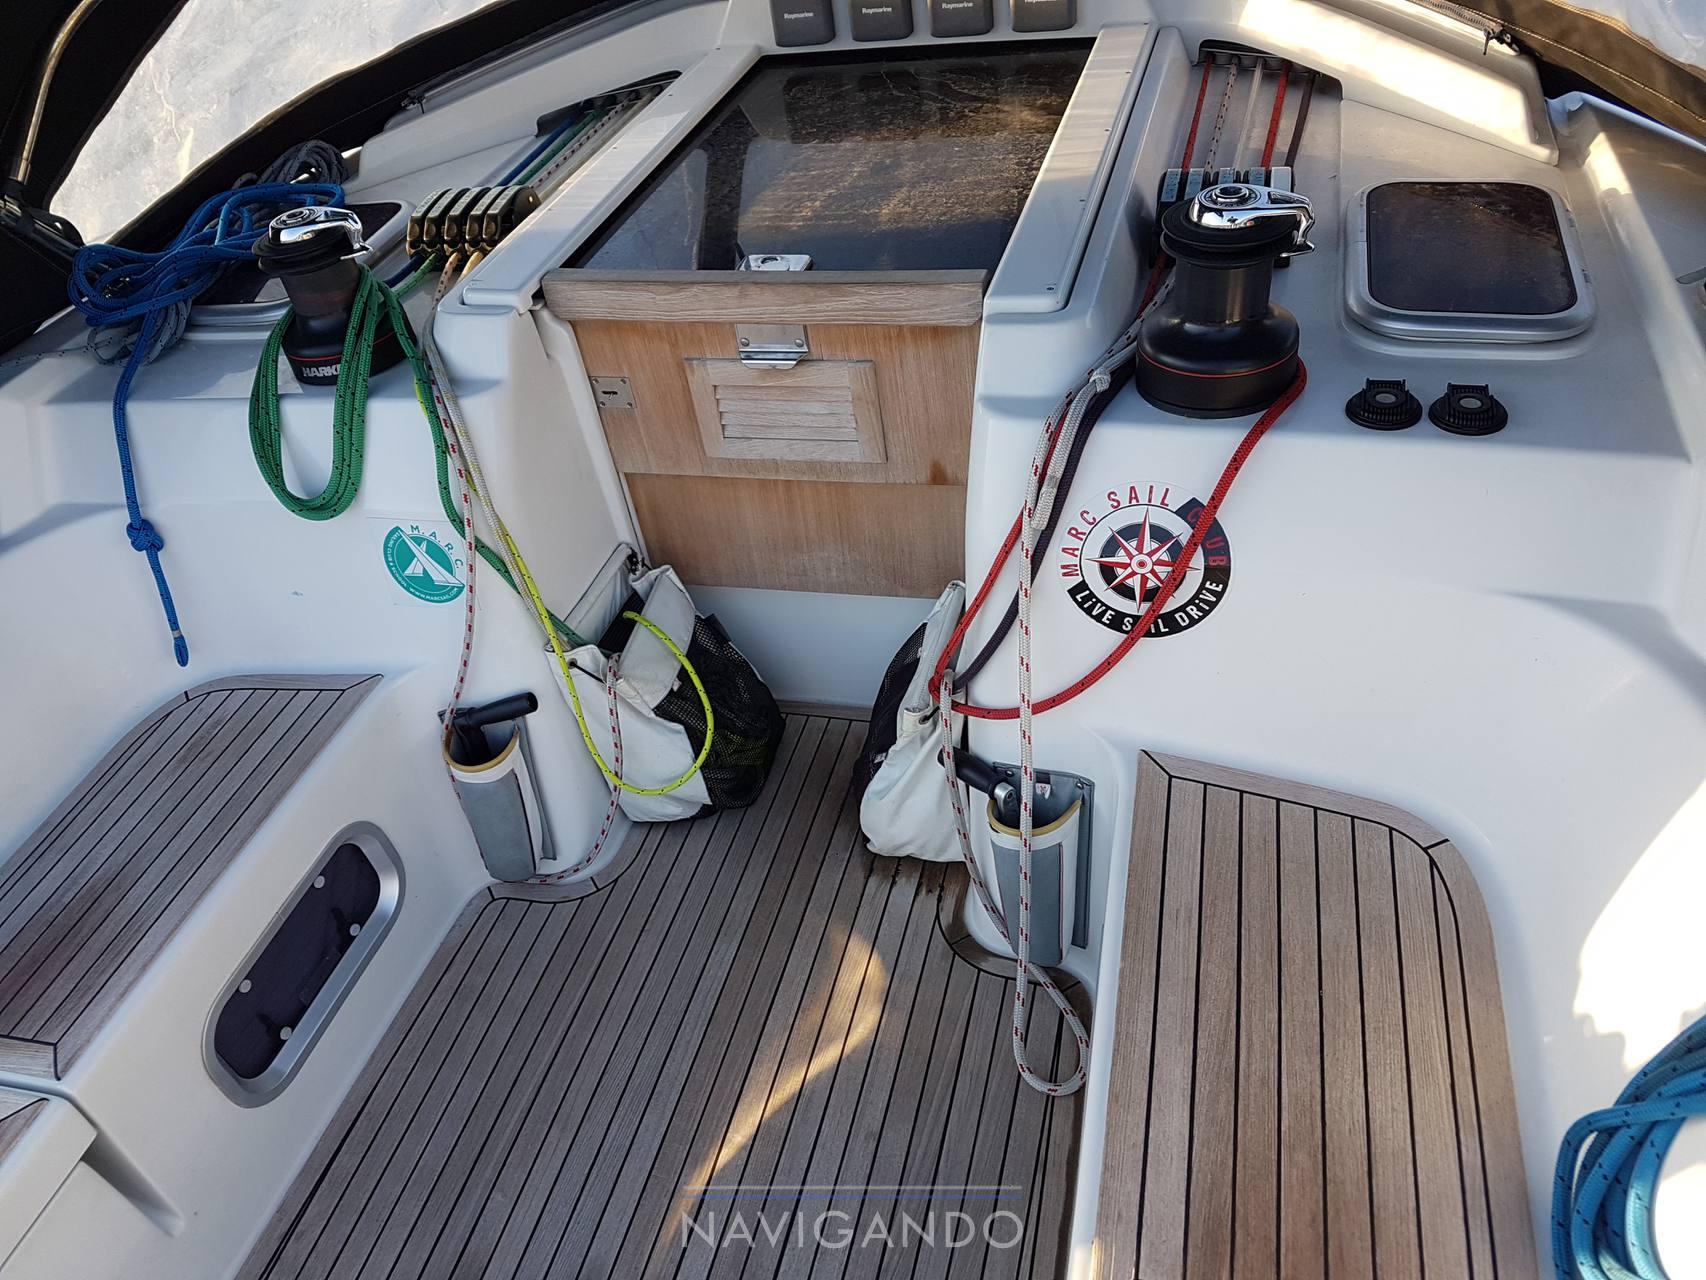 Del pardo Grand soleil 45 Sailing boat used for sale